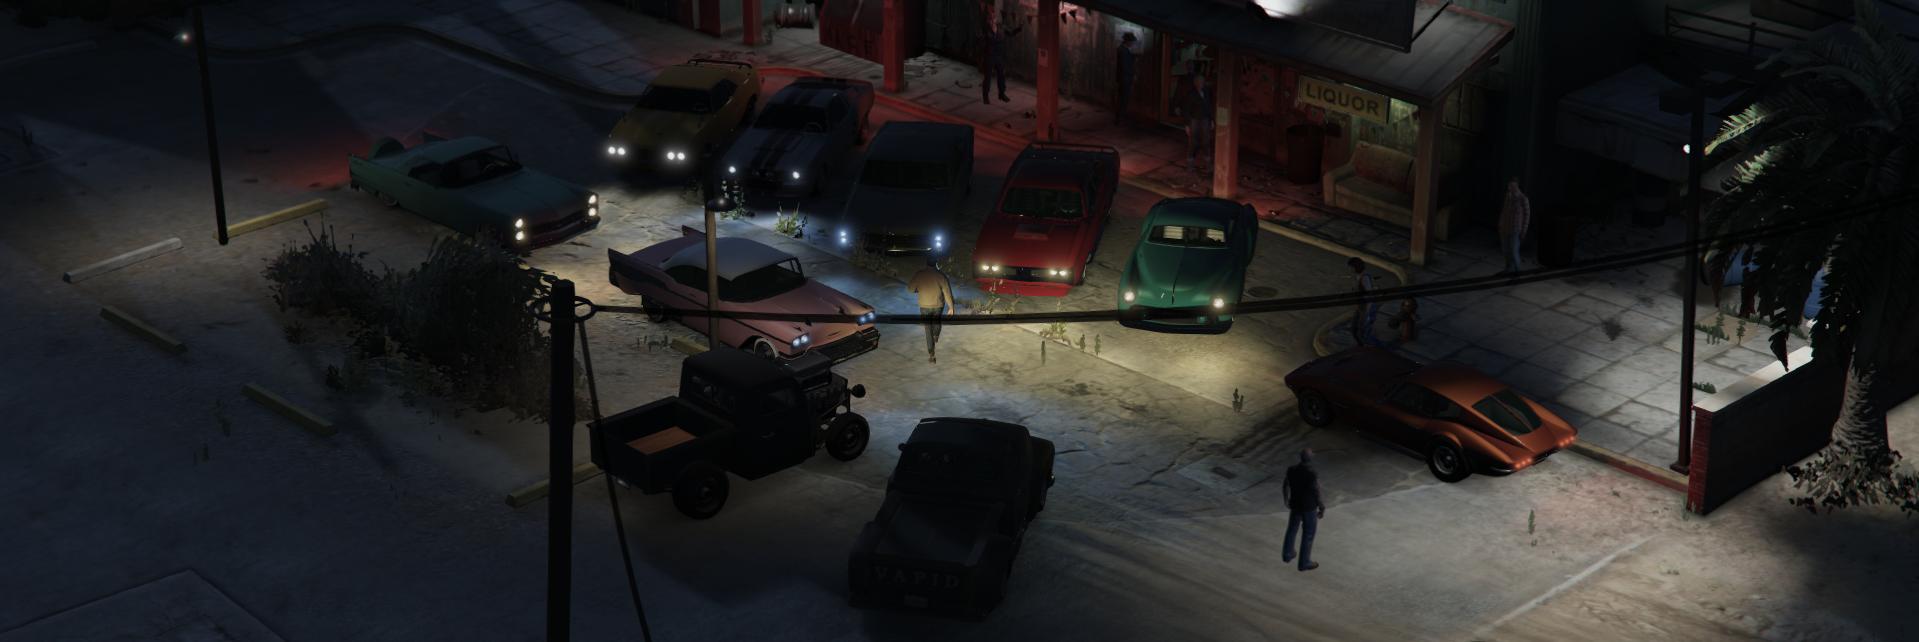 Grand_Theft_Auto_V_04_04_2018_15_48_20_2